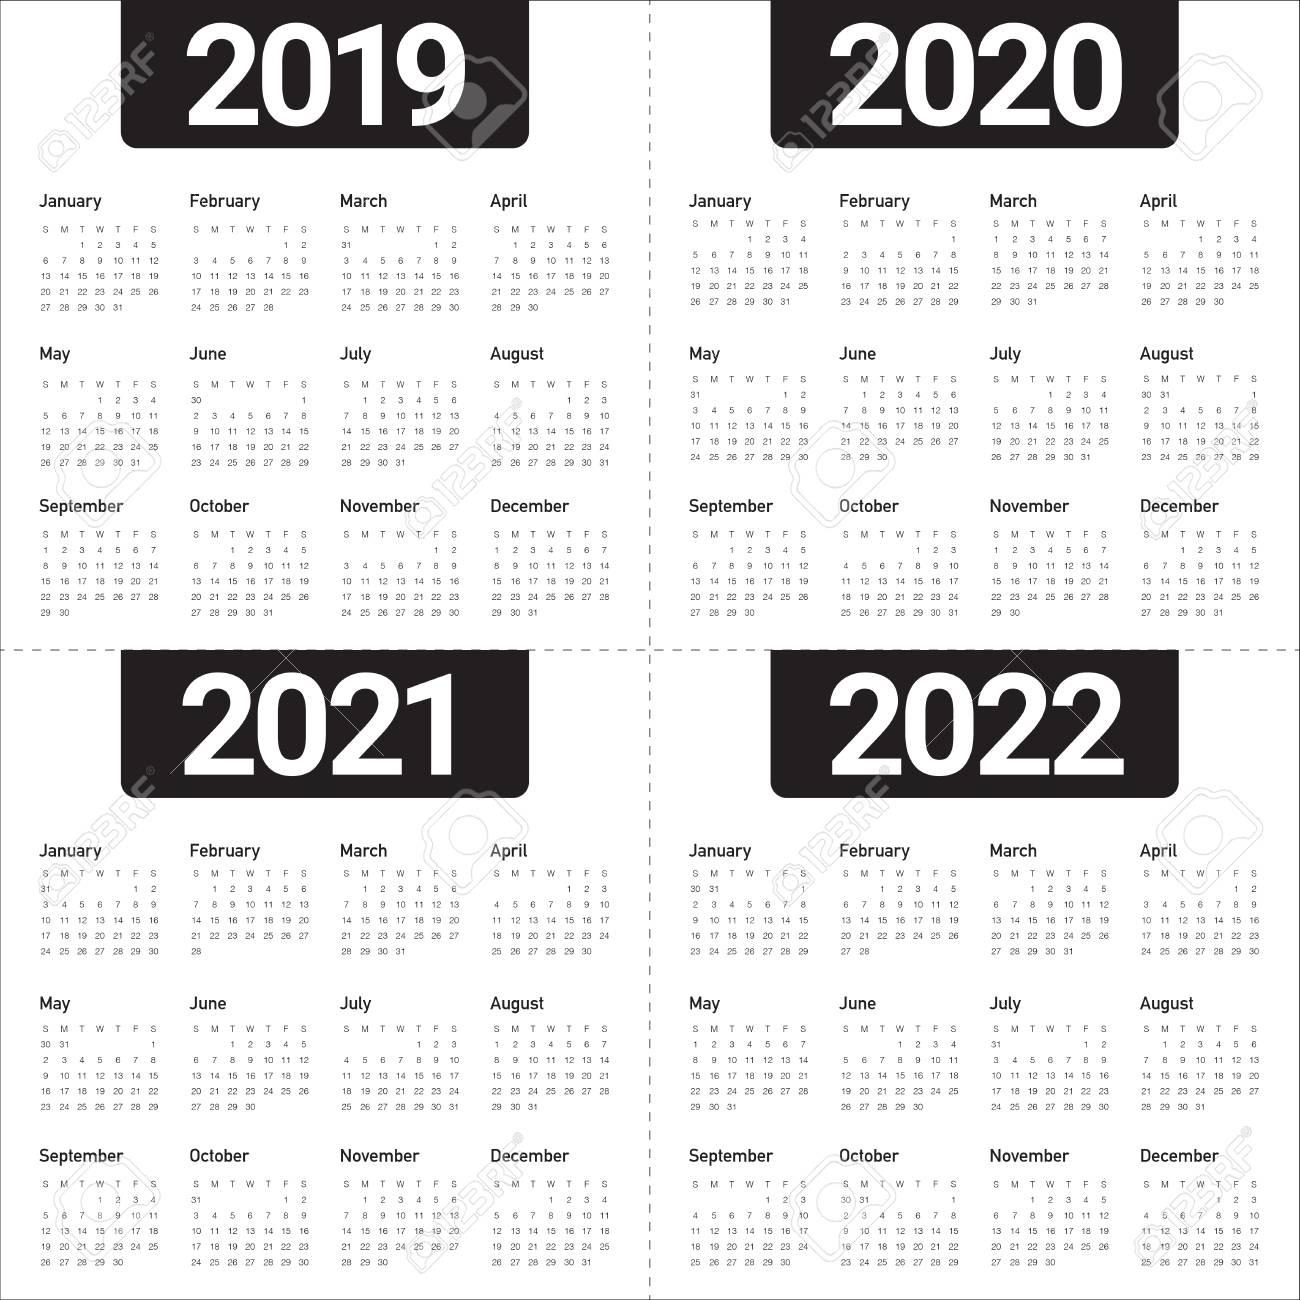 Year 2019 2020 2021 2022 Calendar Vector Design Template, Simple.. with regard to Calendar Print Out 2019 2020 2021 2022